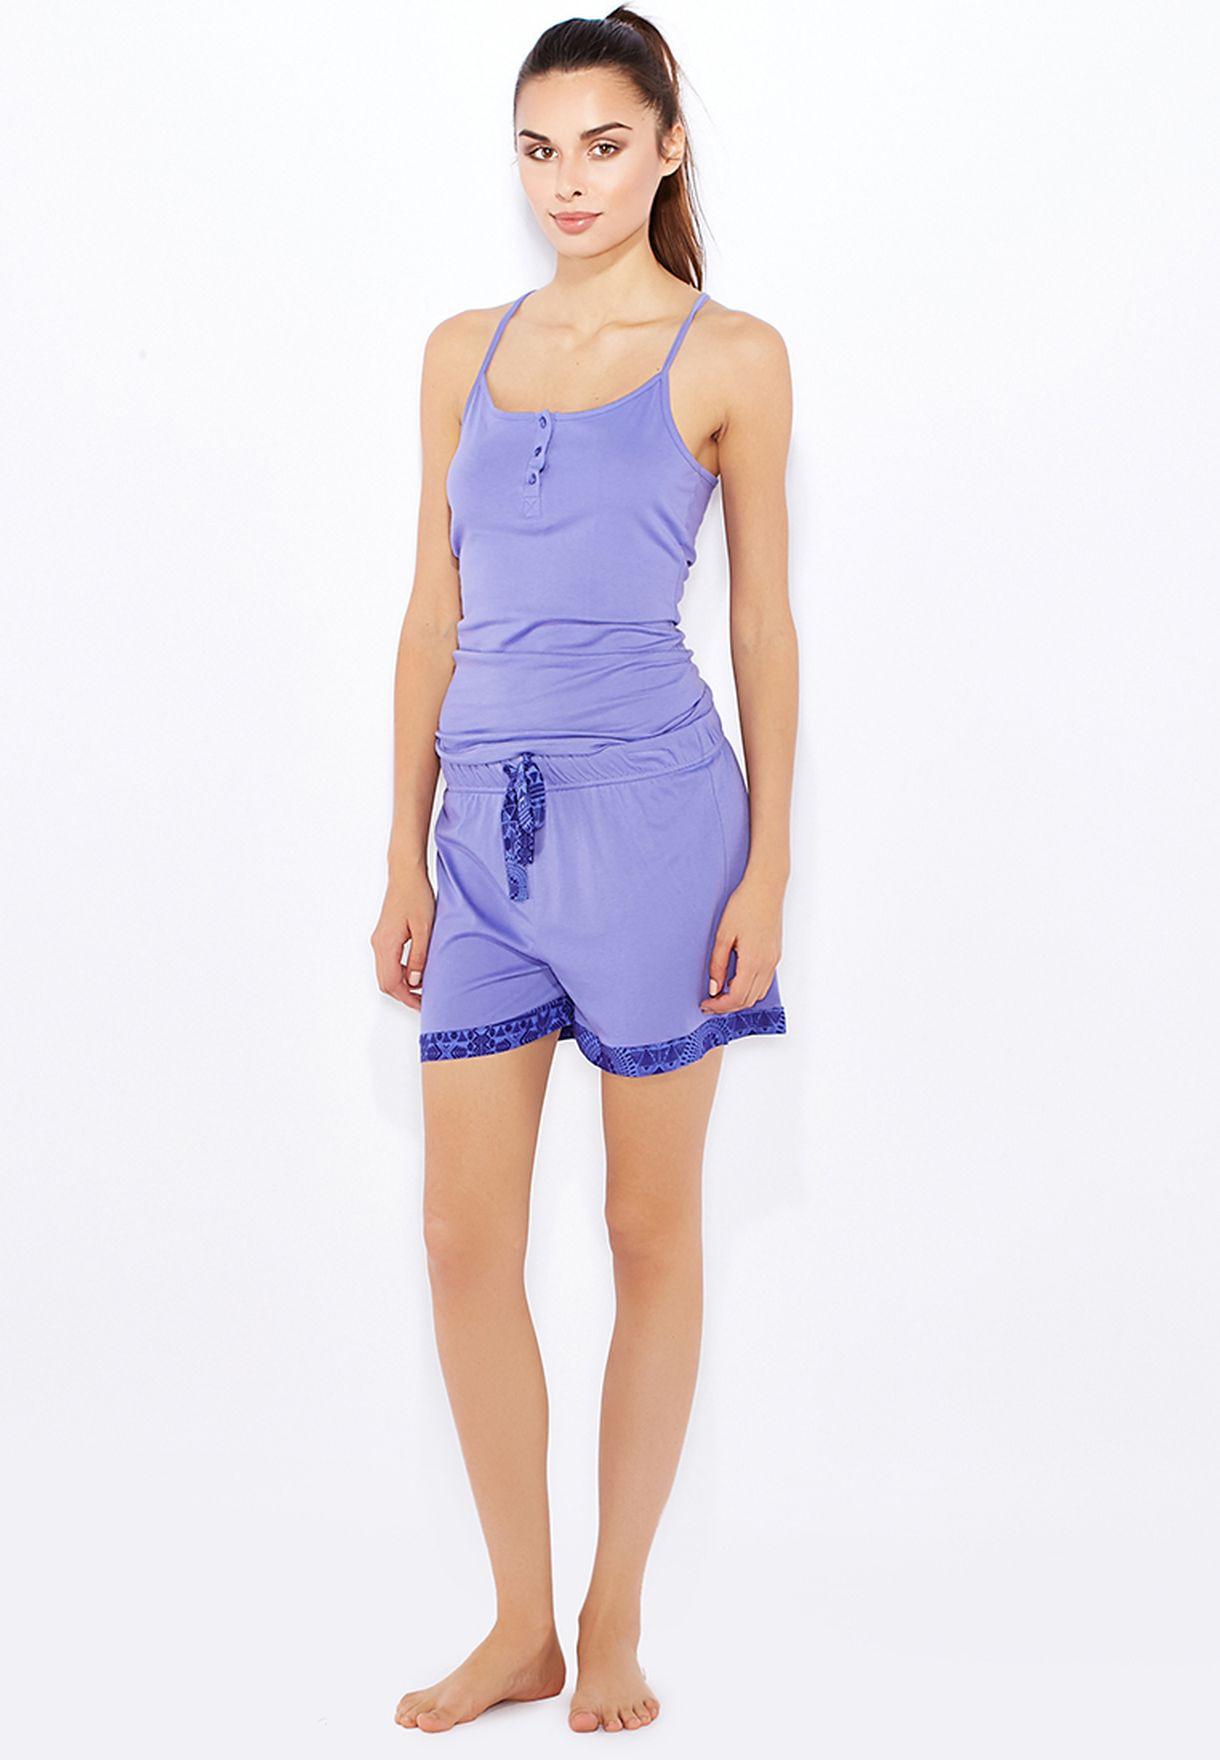 Tom Franks Ladies Printed Short and Vest Pyjama Lounge Set